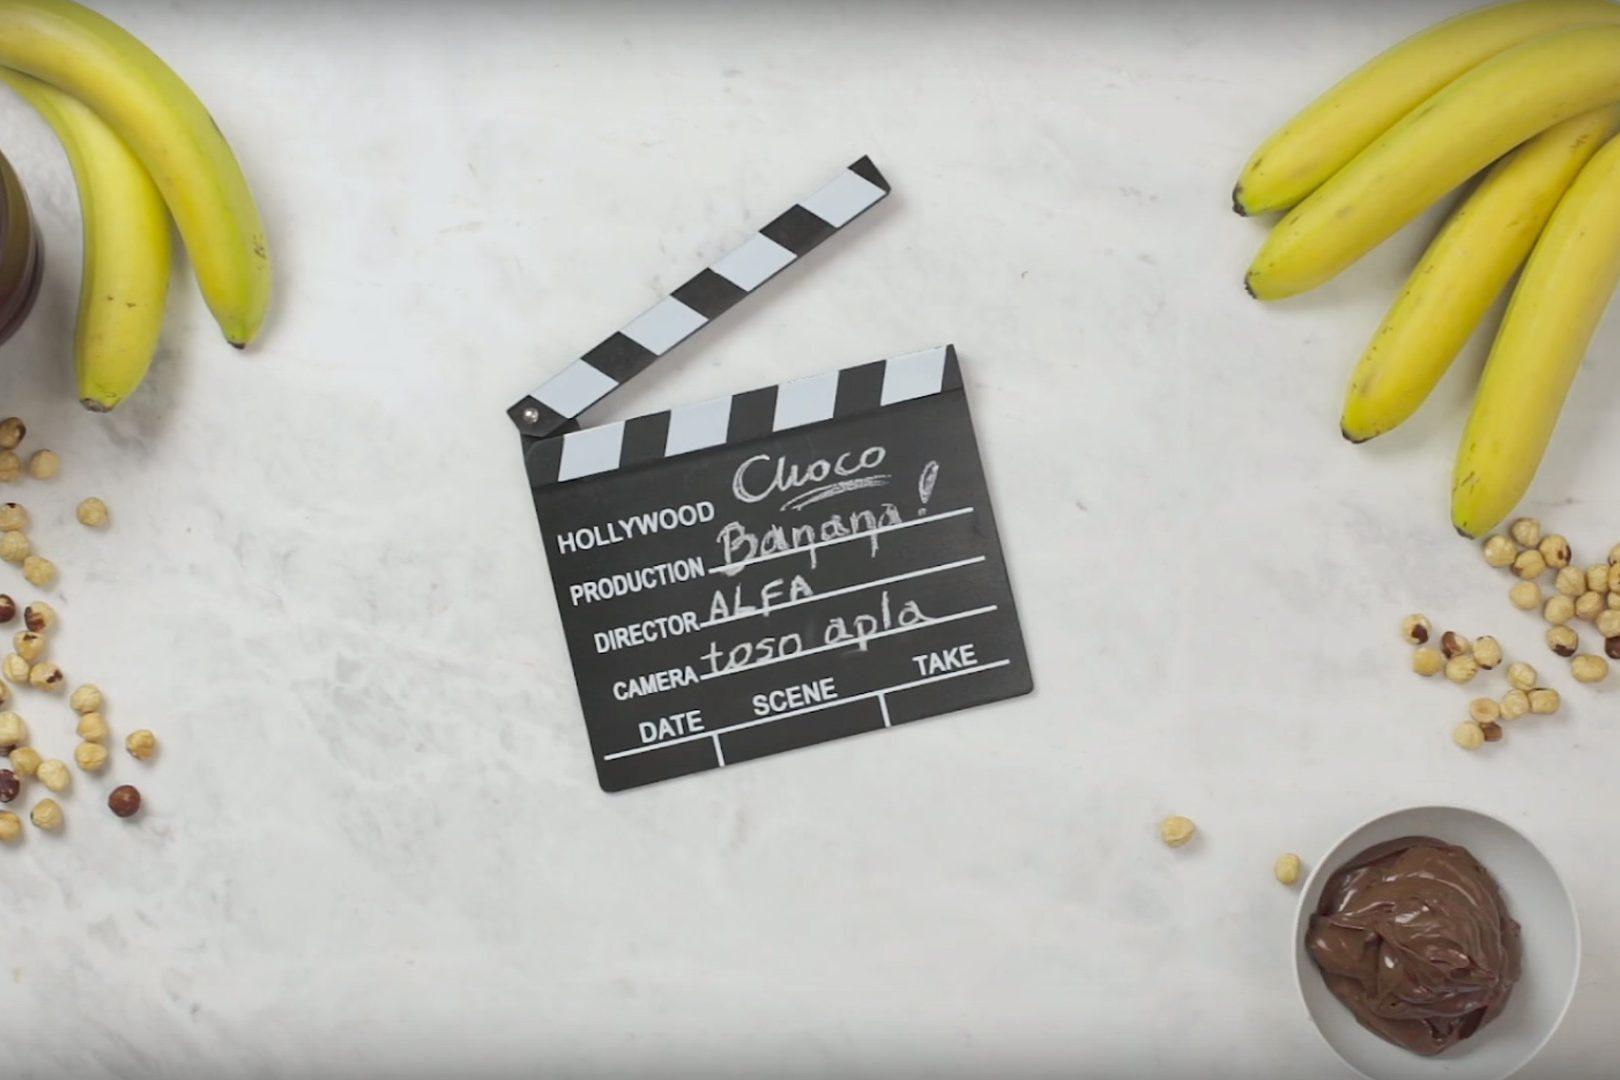 choco-banana image